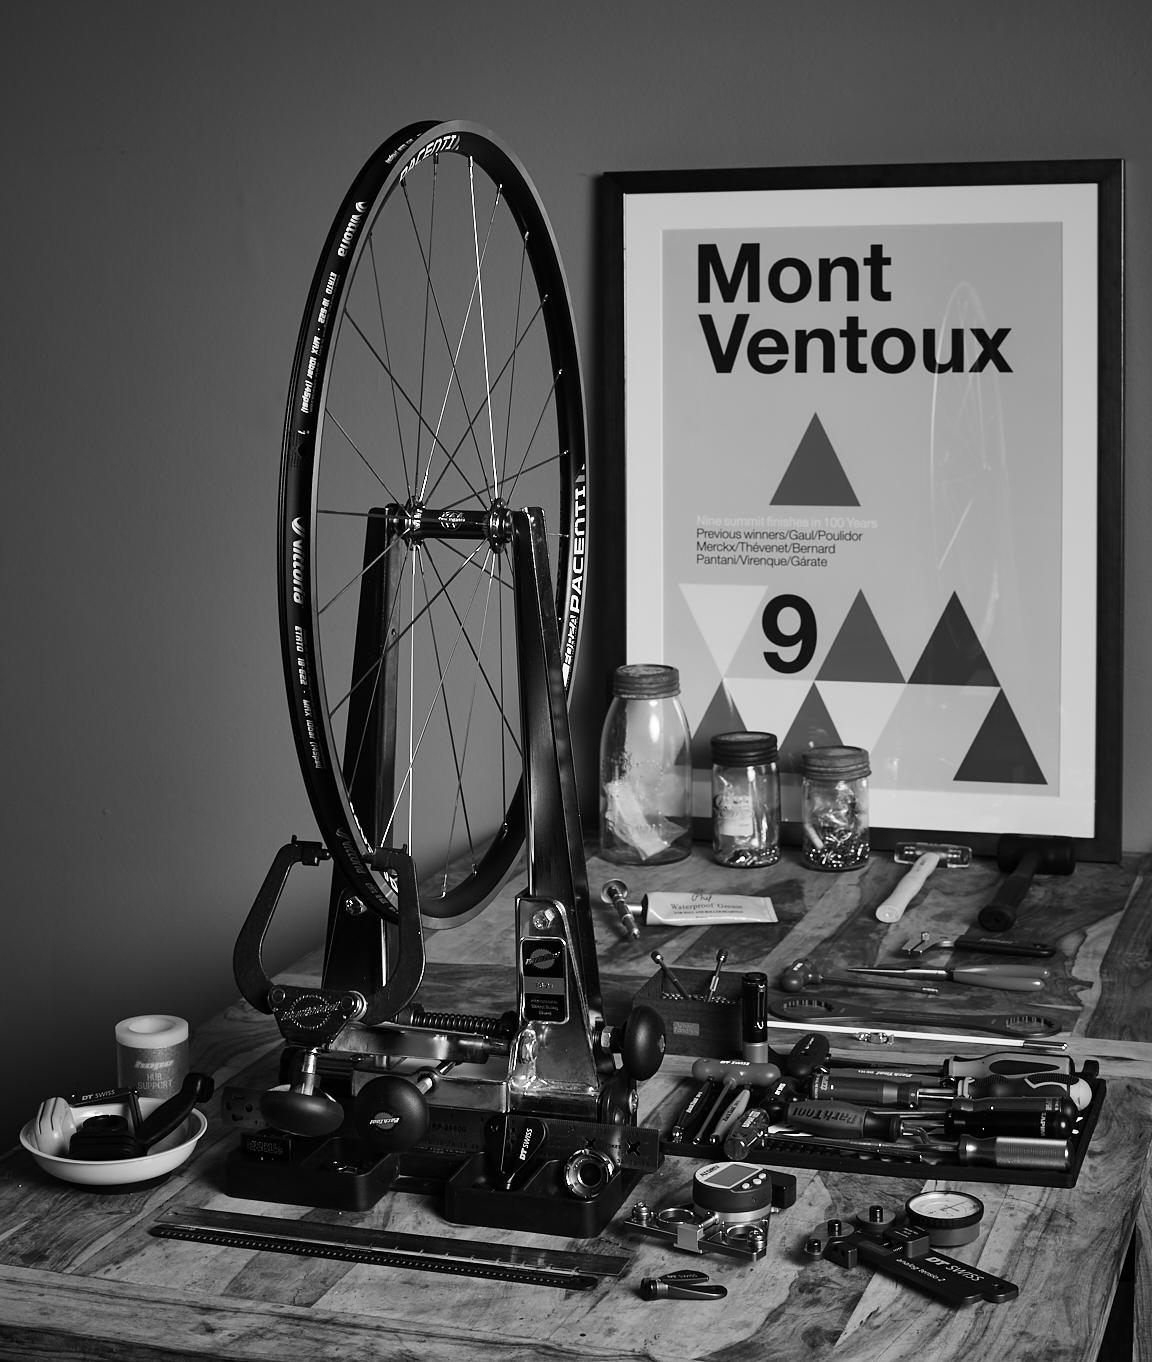 Cognoscenti Cycles website0035 1 1.jpg